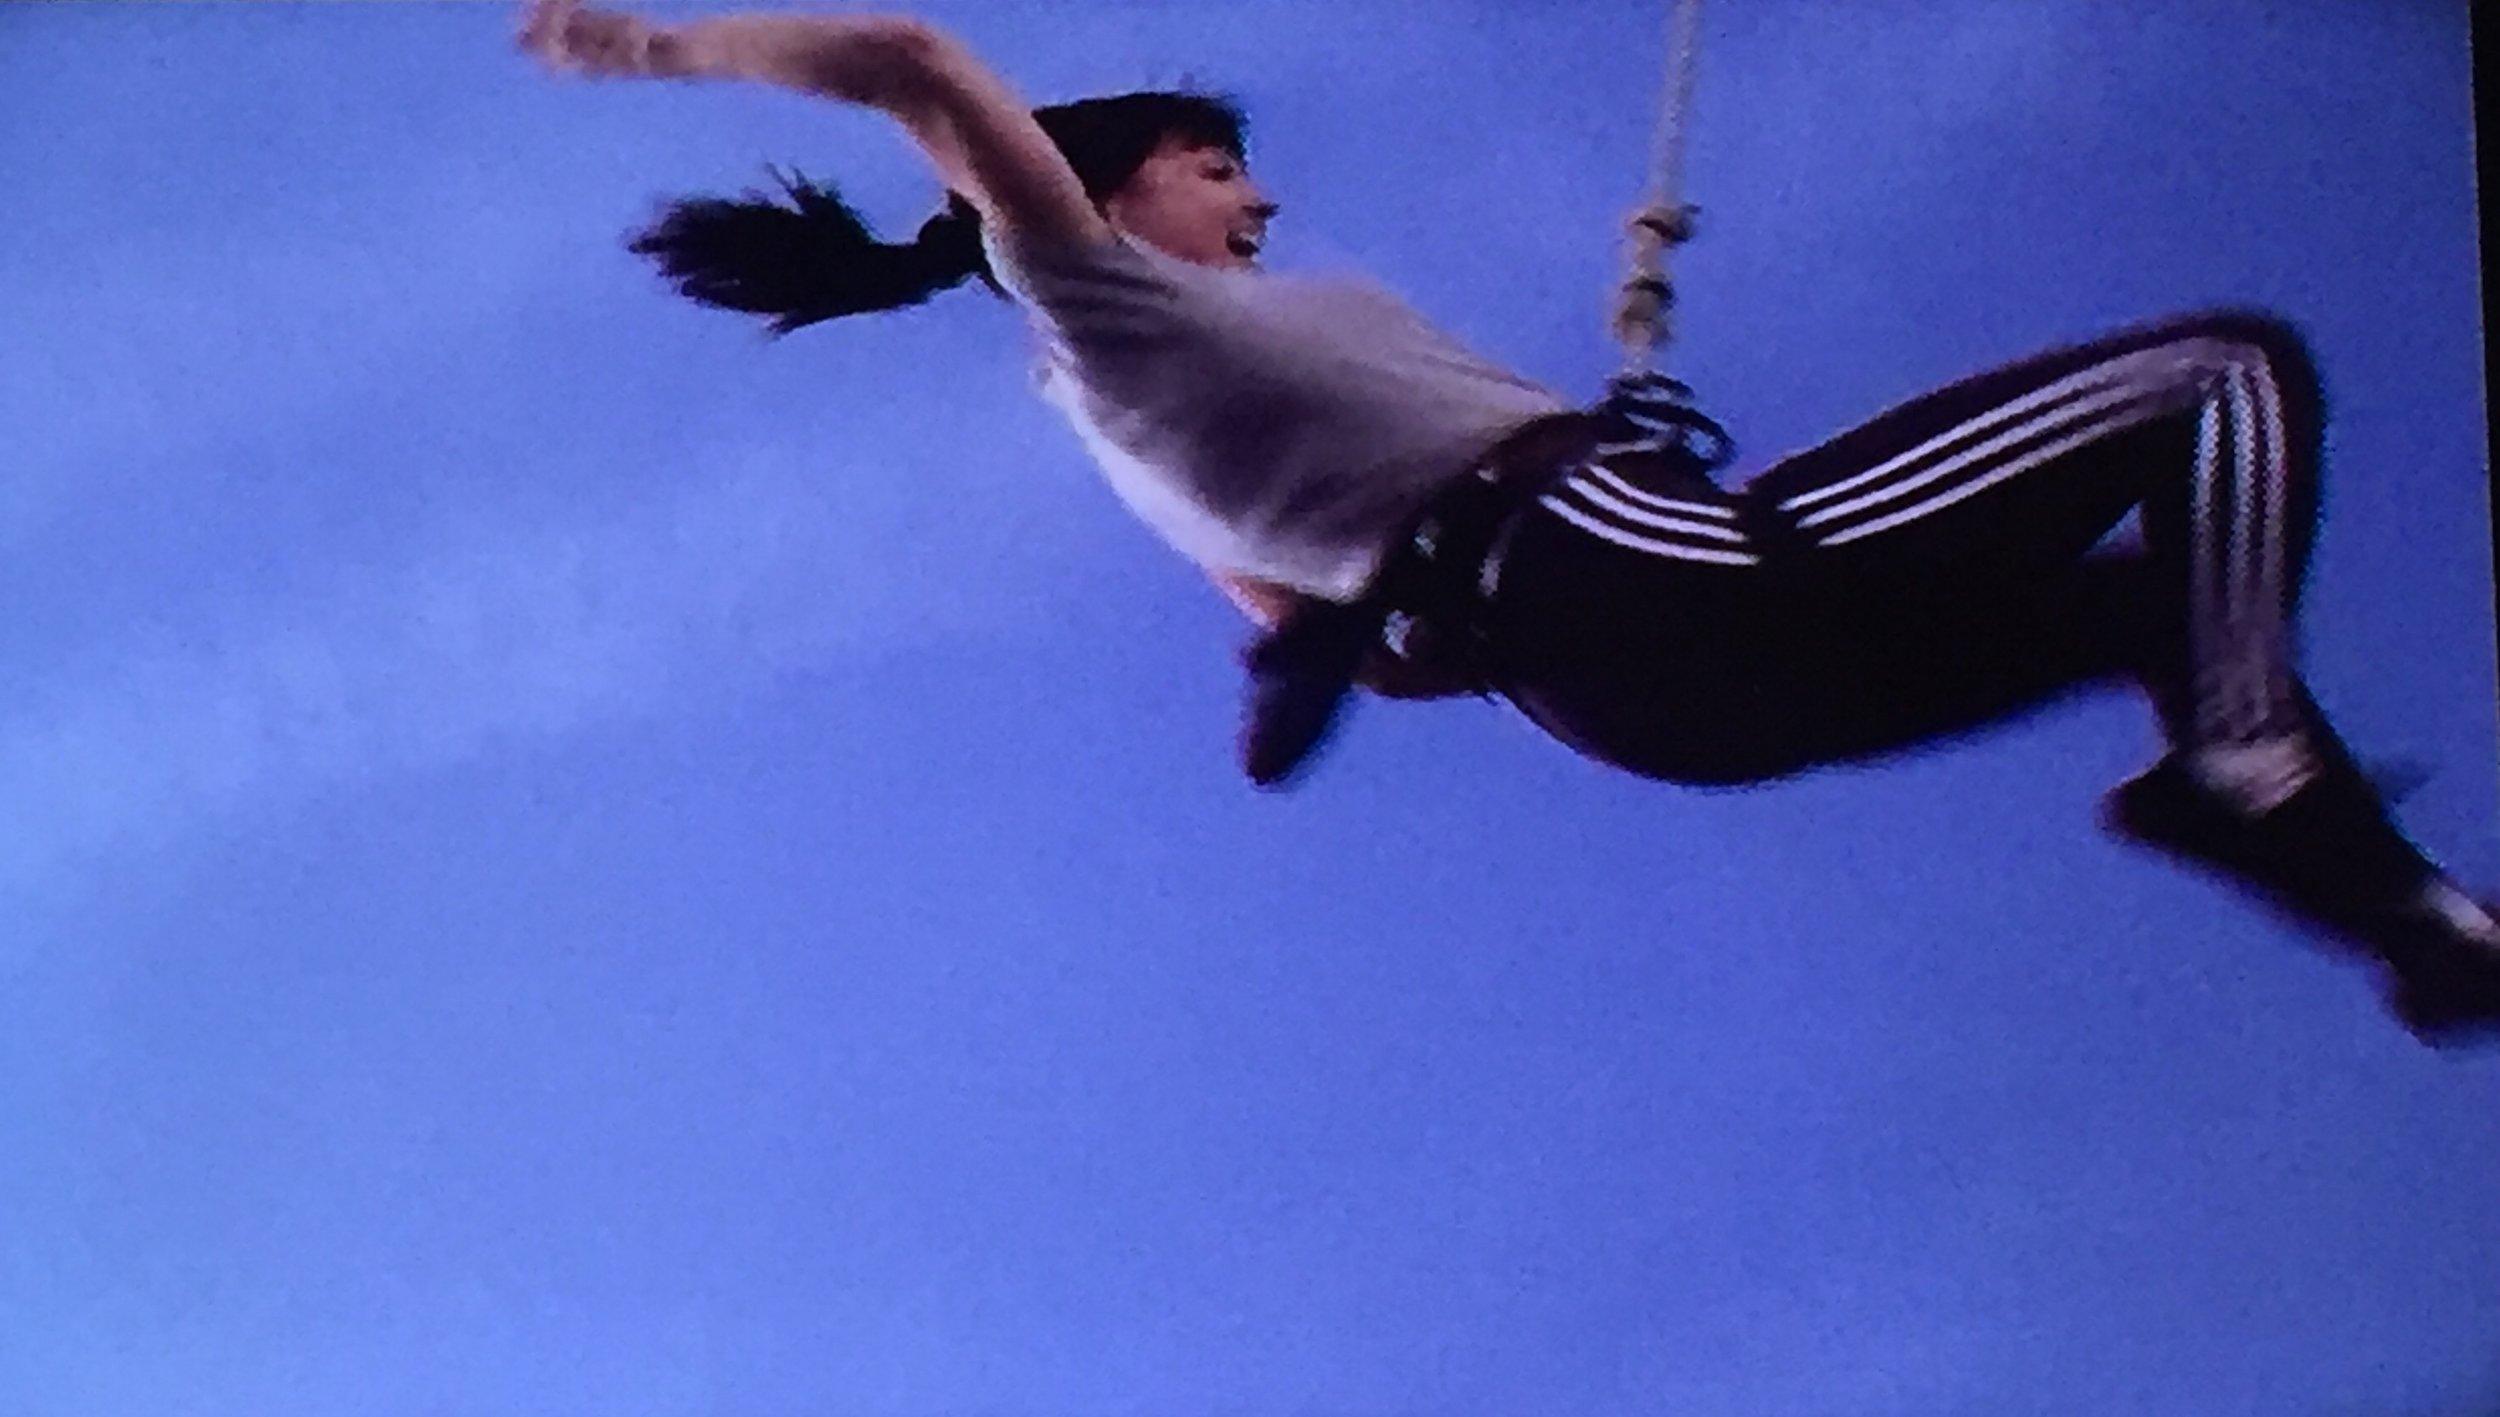 Rock climbing, er, falling stunt double.